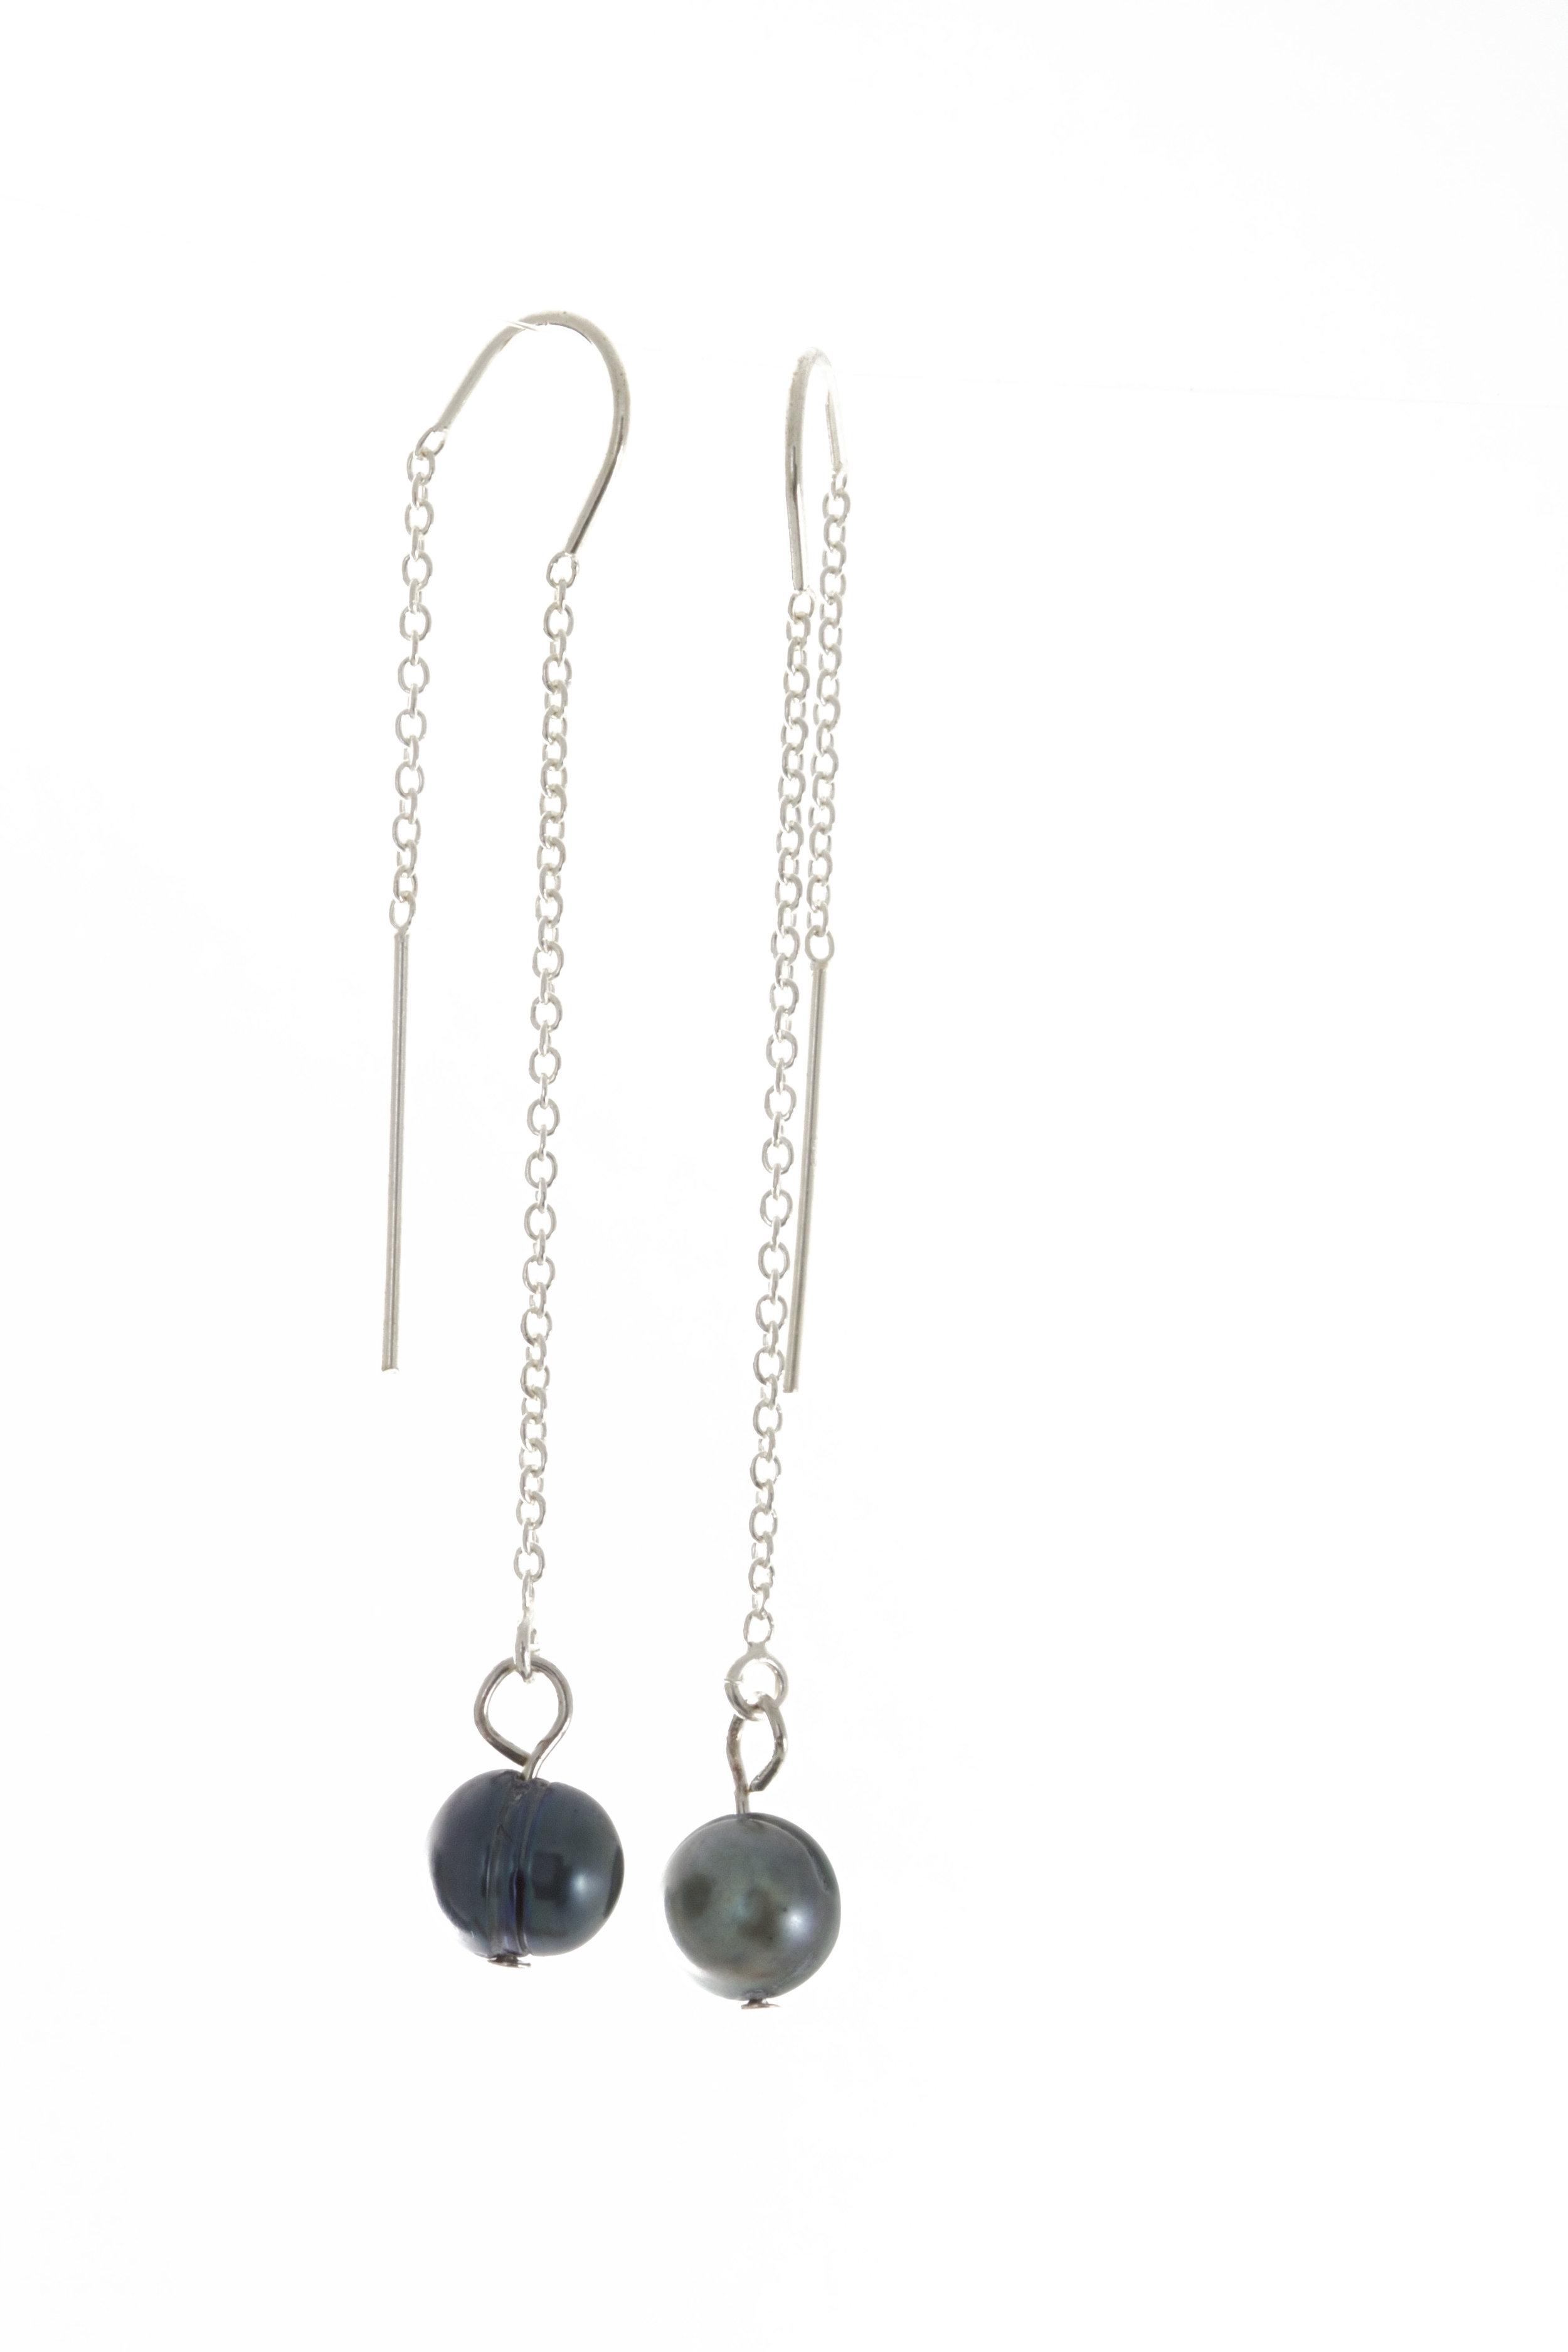 Blue baroque pearl earrings sterling silver ear wires.